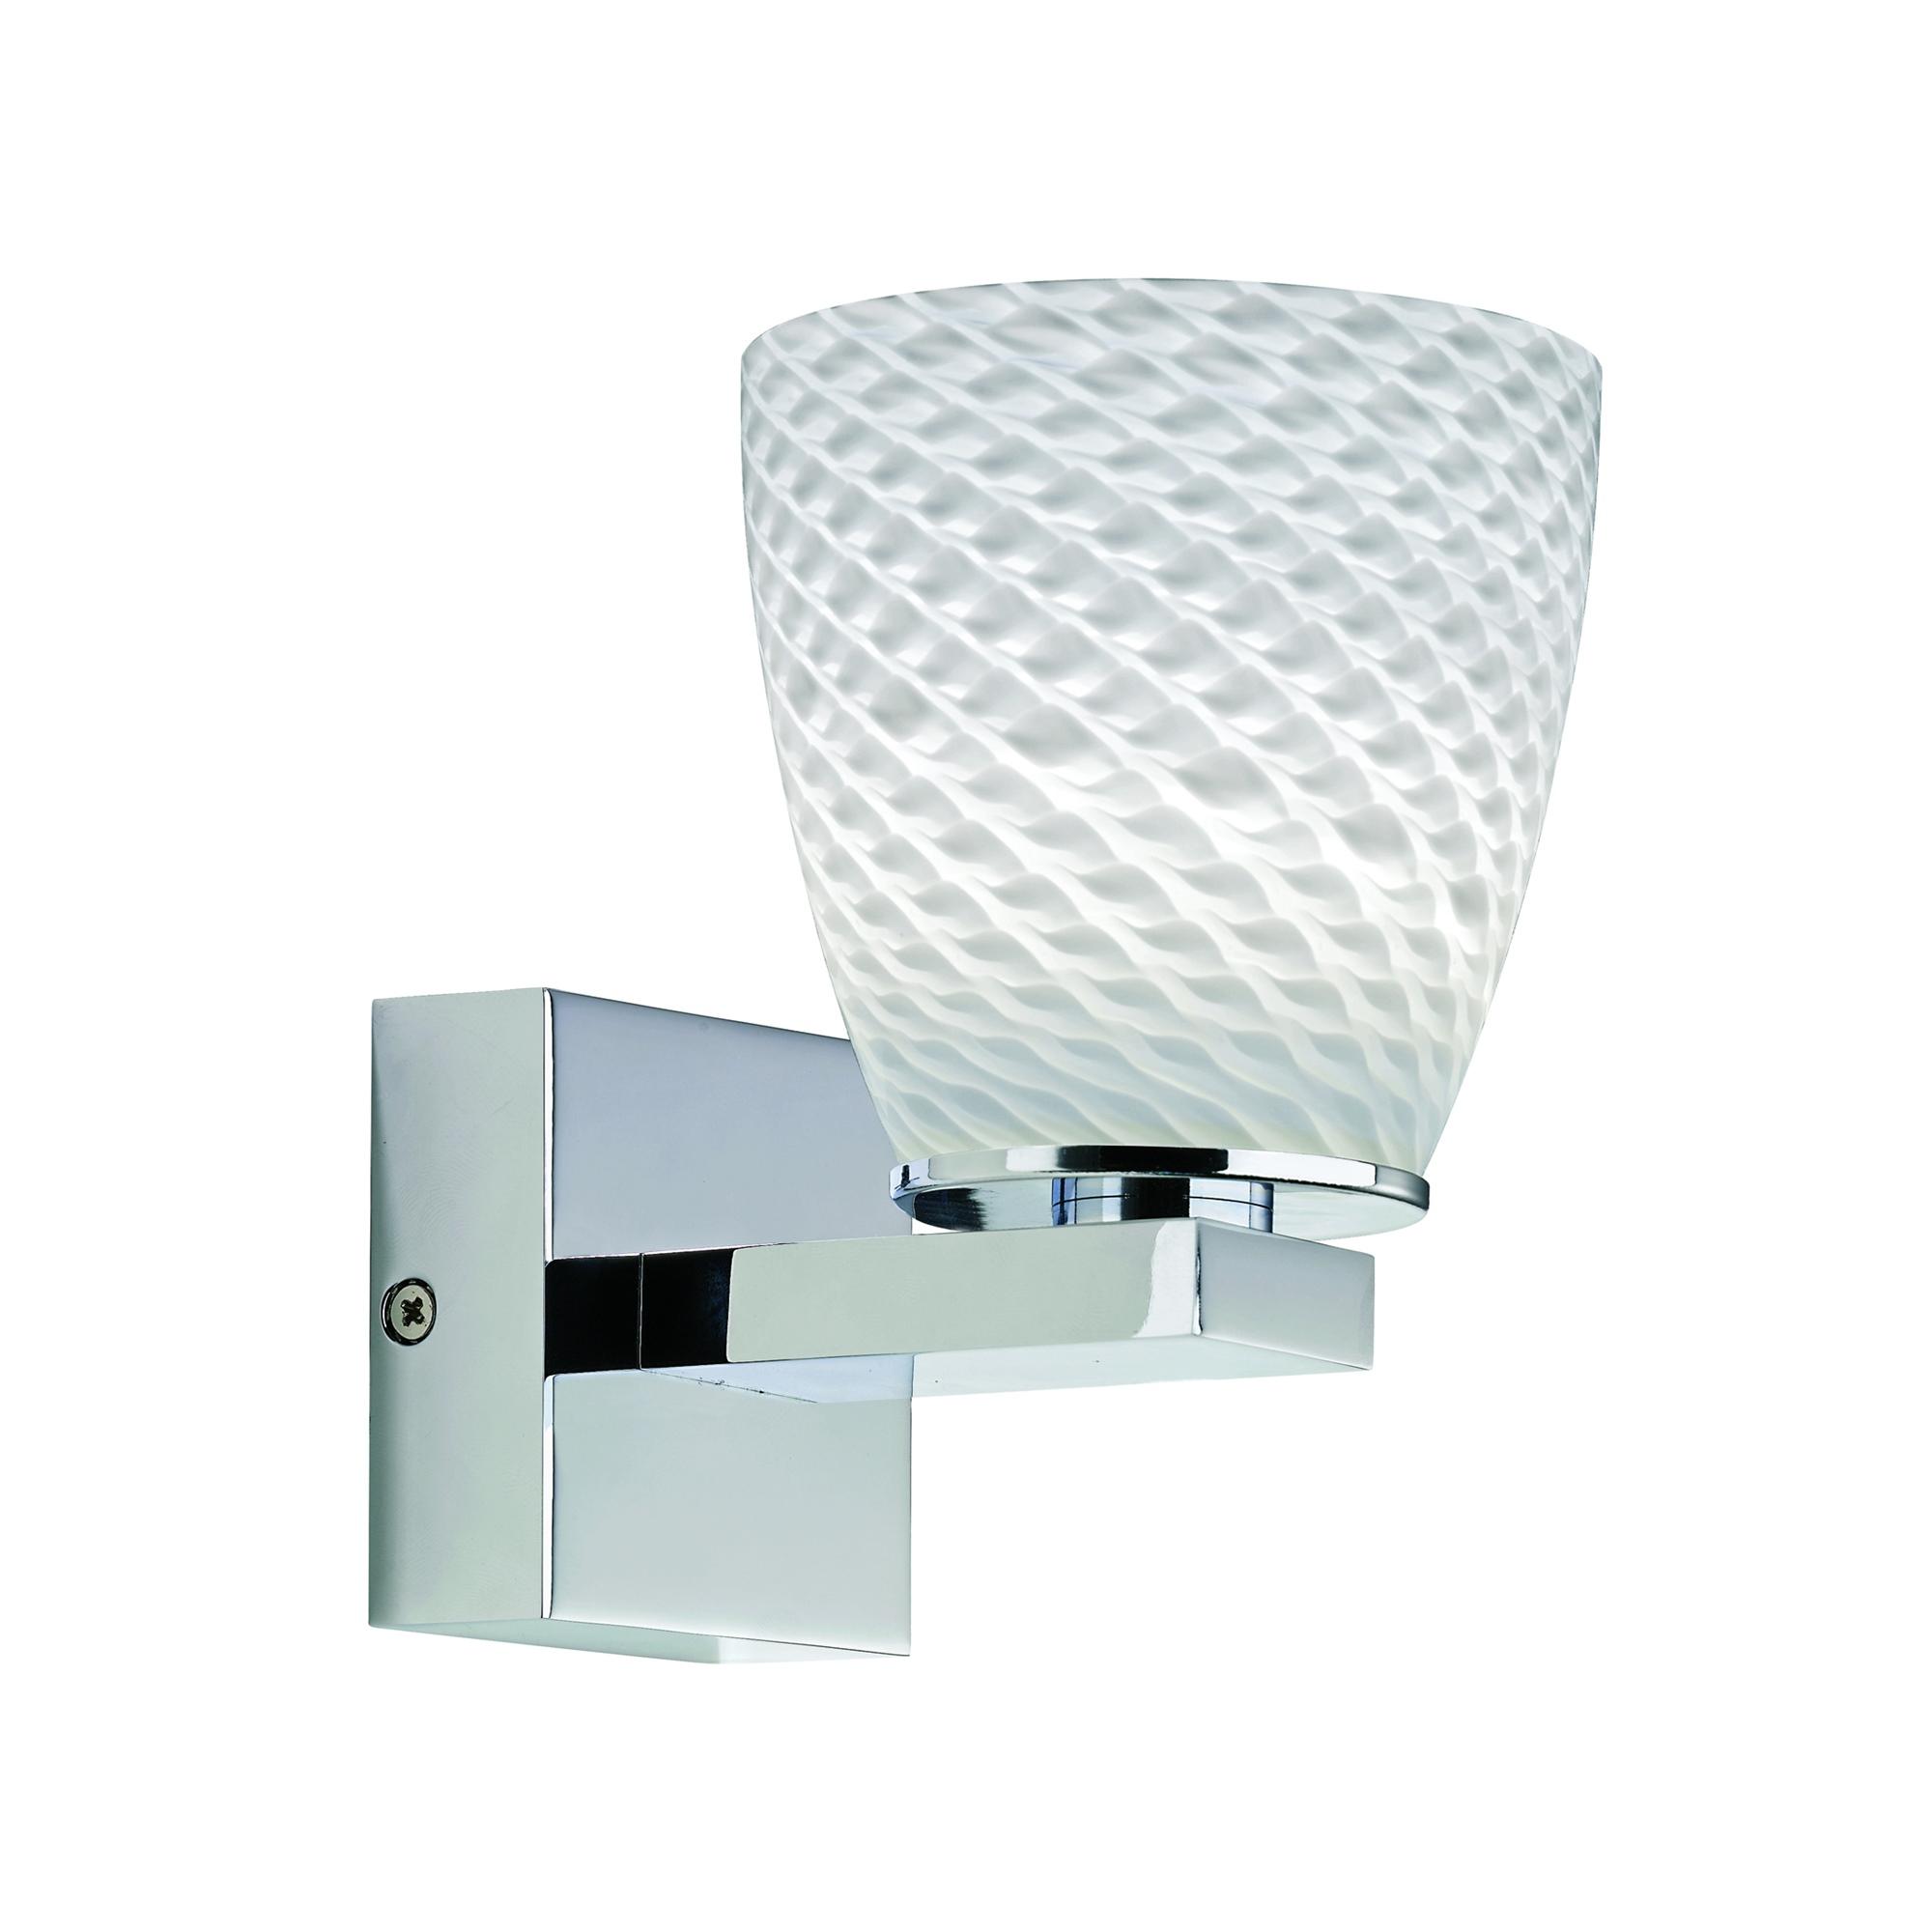 Lampenlux LED Wandlampe Alonso Kristall Glas Glasschirm Opal/weiß Chrom 3W inkl. Driver Wandleuchte